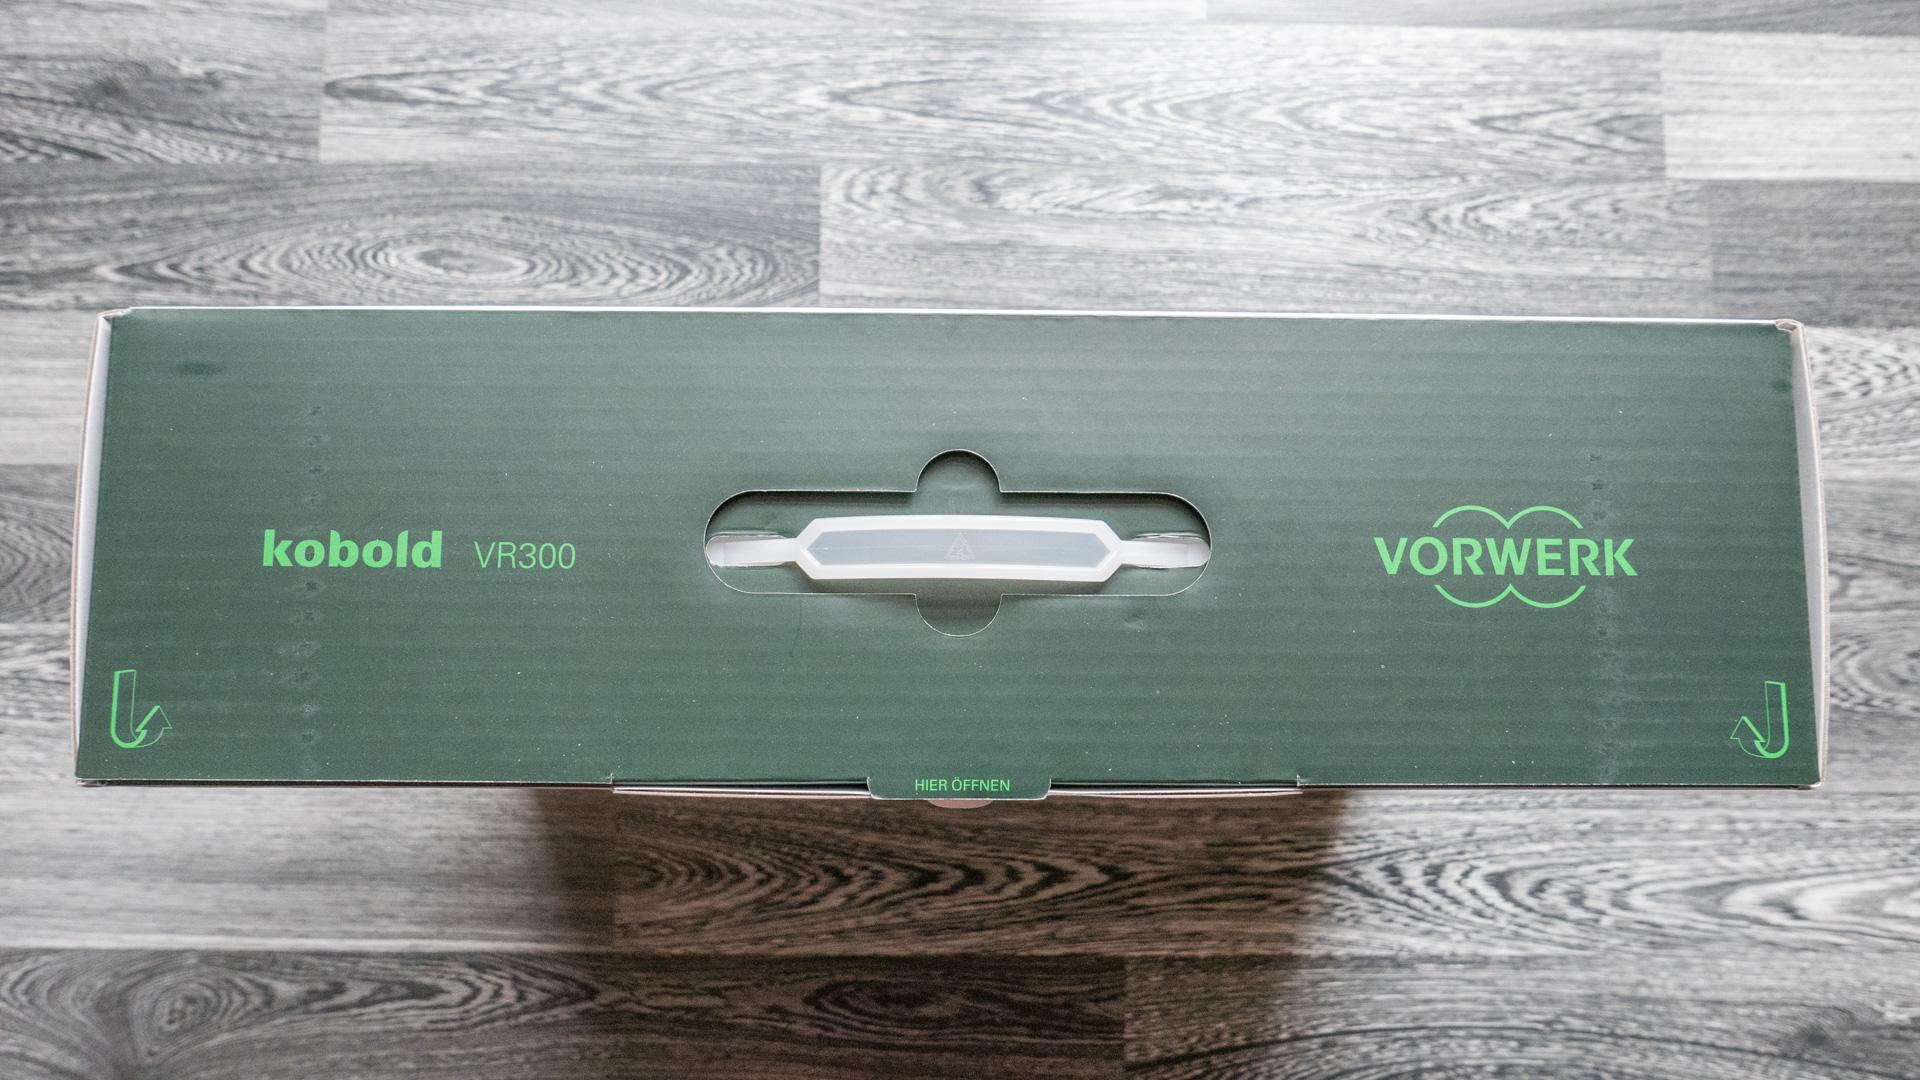 Vorwerk-VR300-Unboxing-6